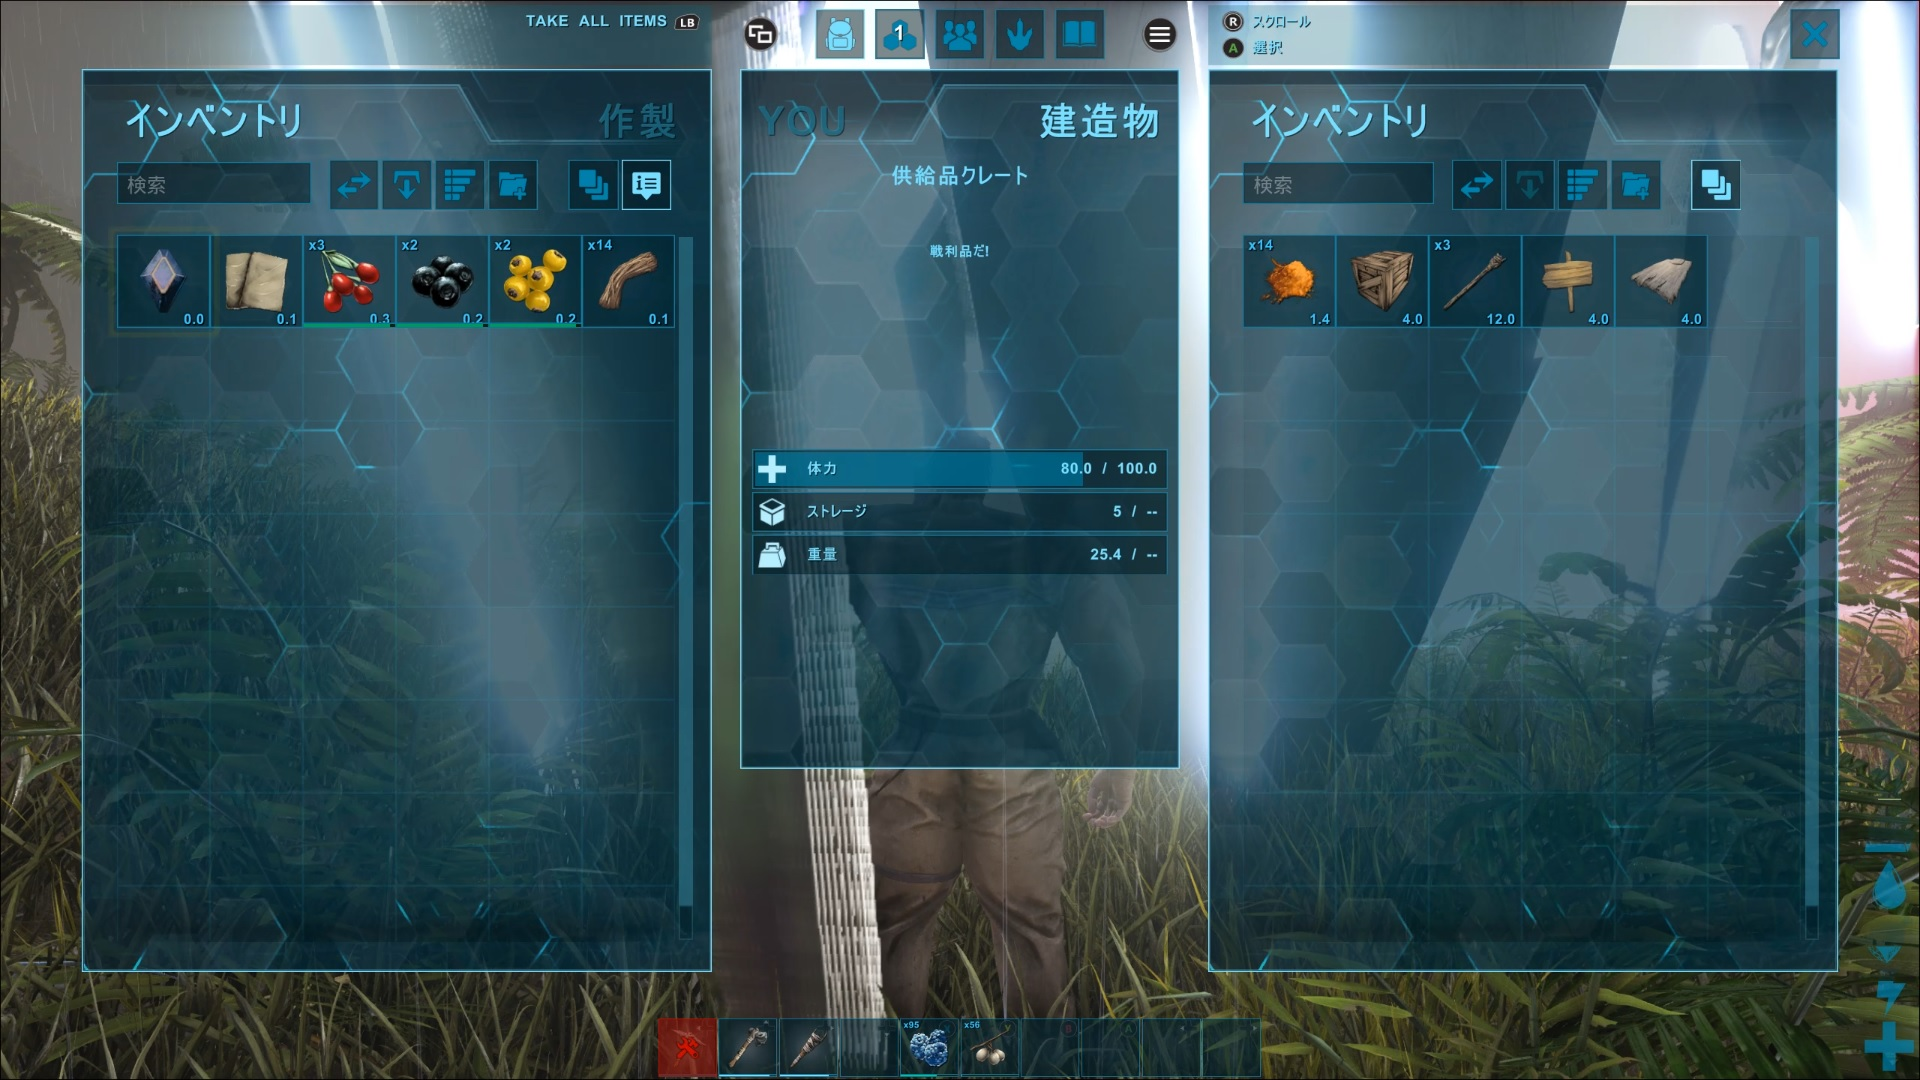 88289a9369f2da8c0f6bf27505d18fbb - 【ARK Survival Evolved】序盤攻略【究極の恐竜時代を生き抜く!】